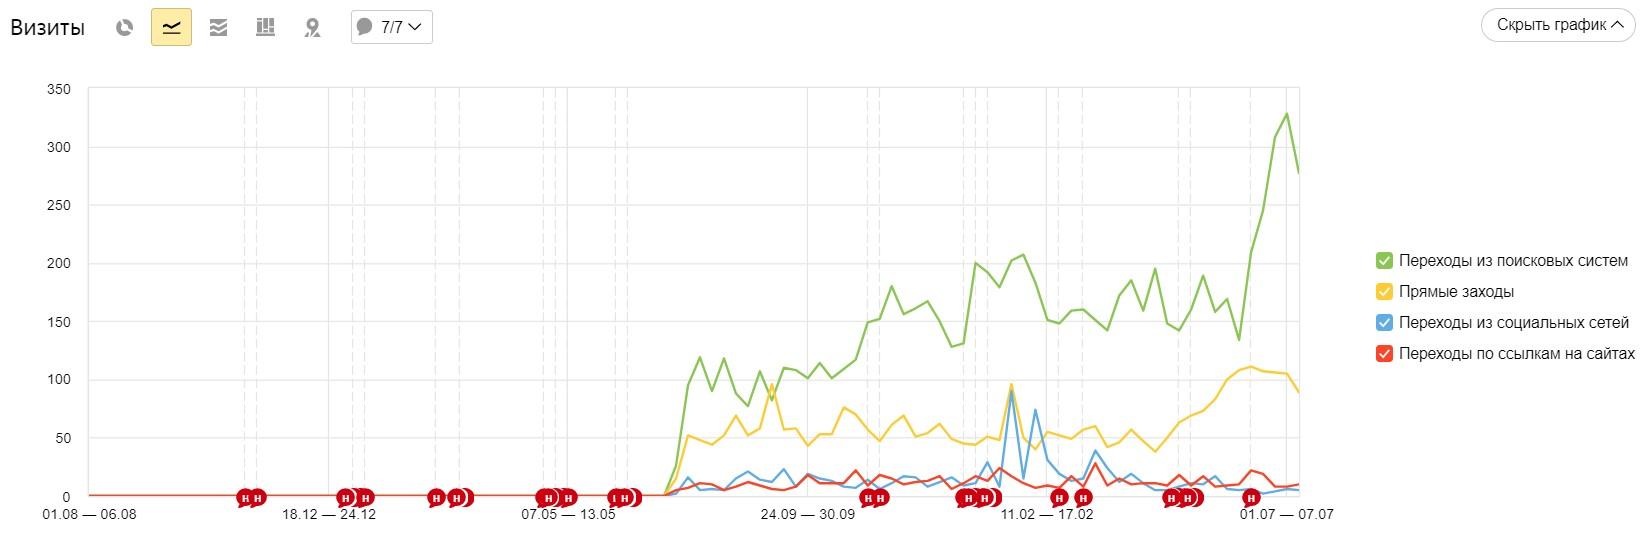 рост трафика со всех каналов отображен на графике